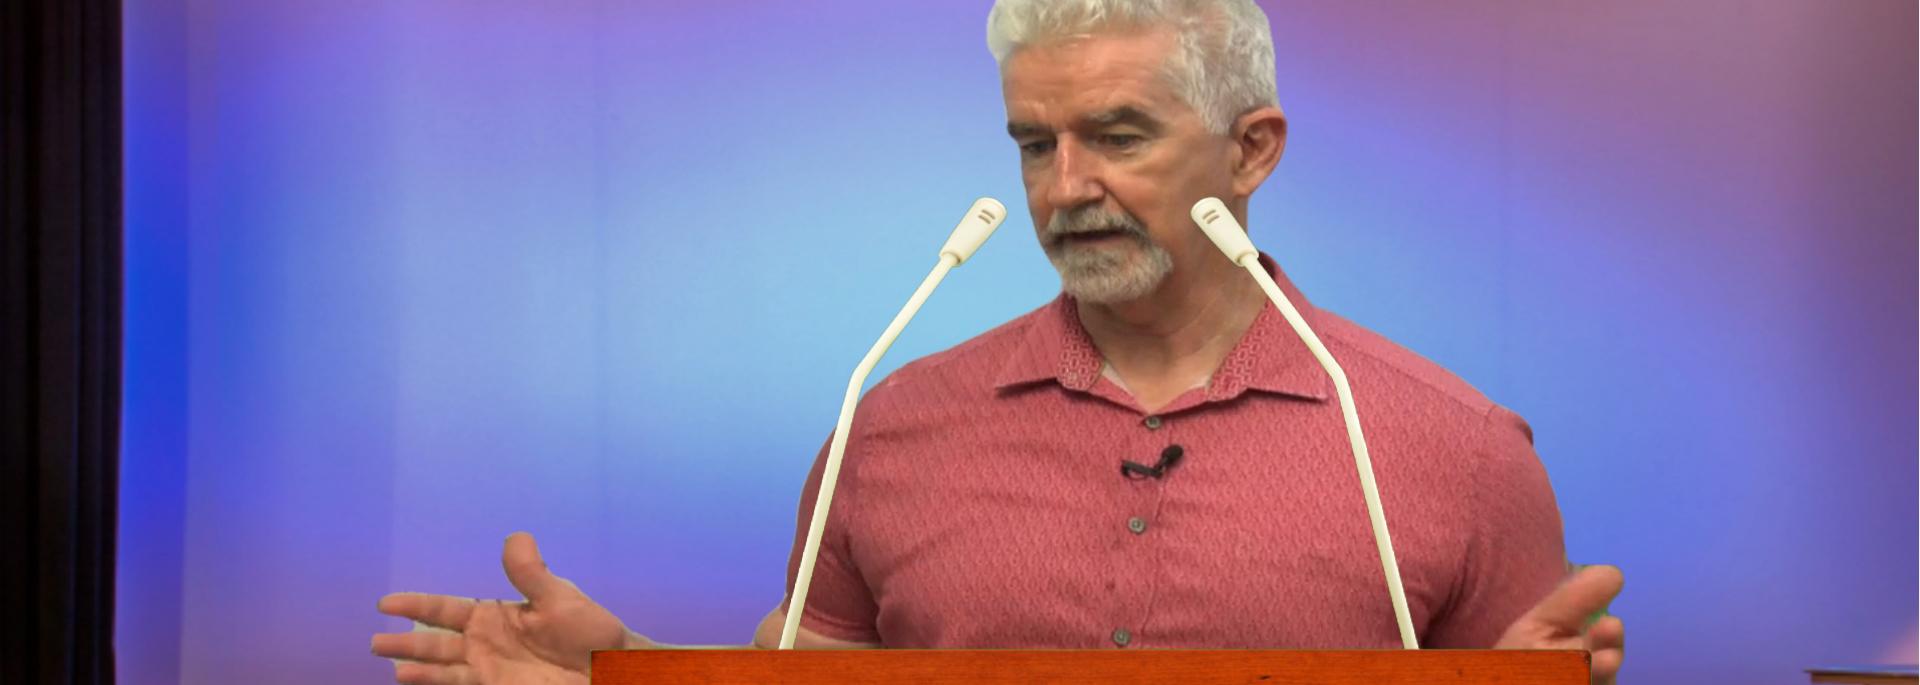 Dr Gibney presenting